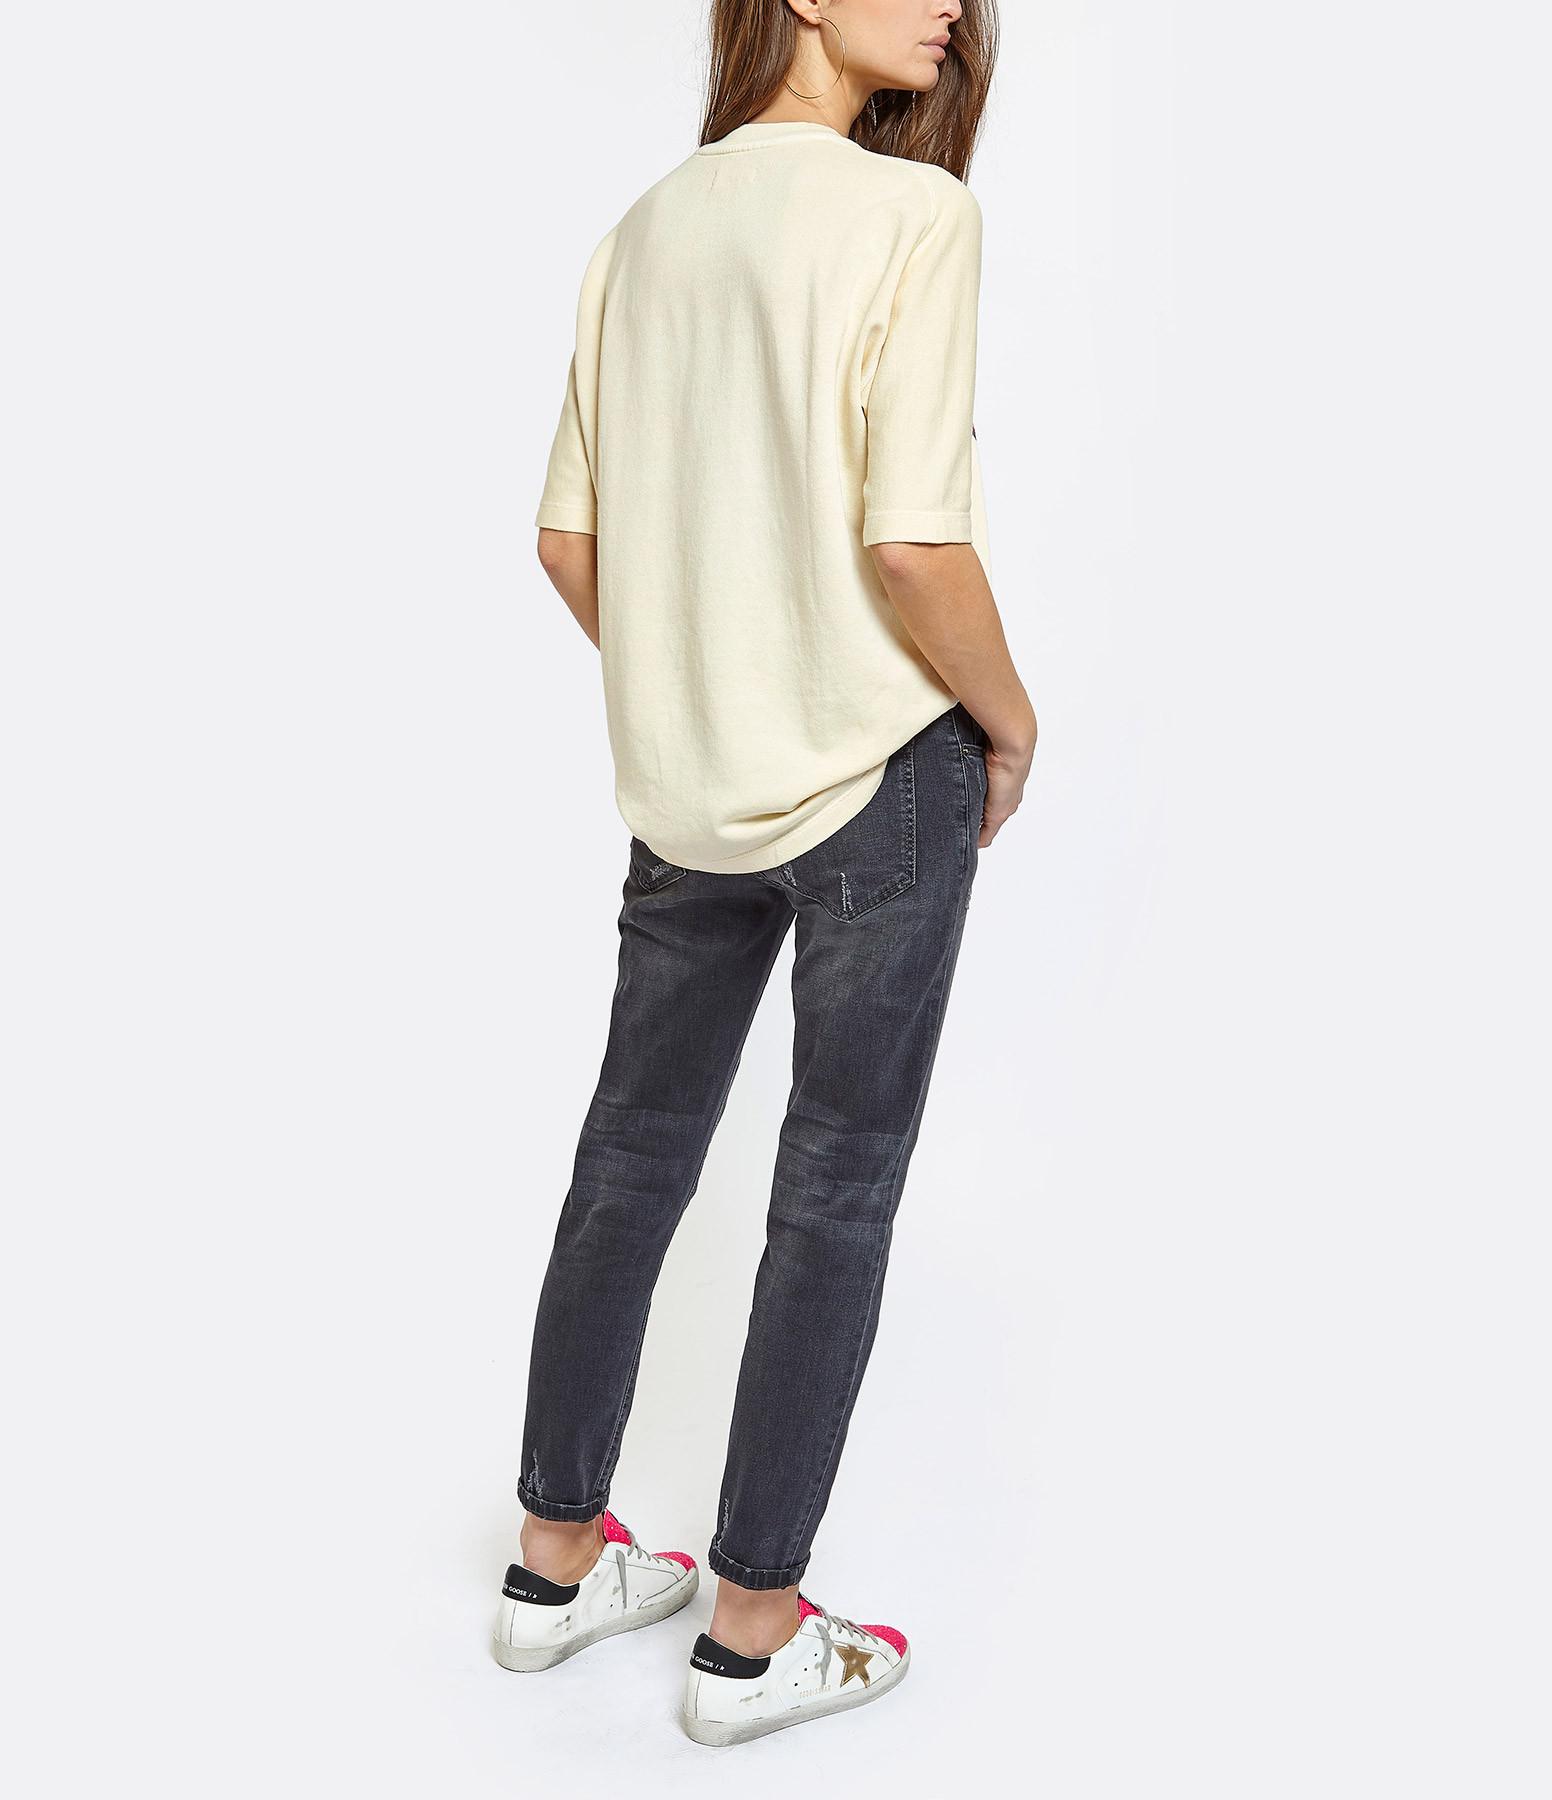 ZADIG & VOLTAIRE - Tee-shirt Portland Coton Vanille